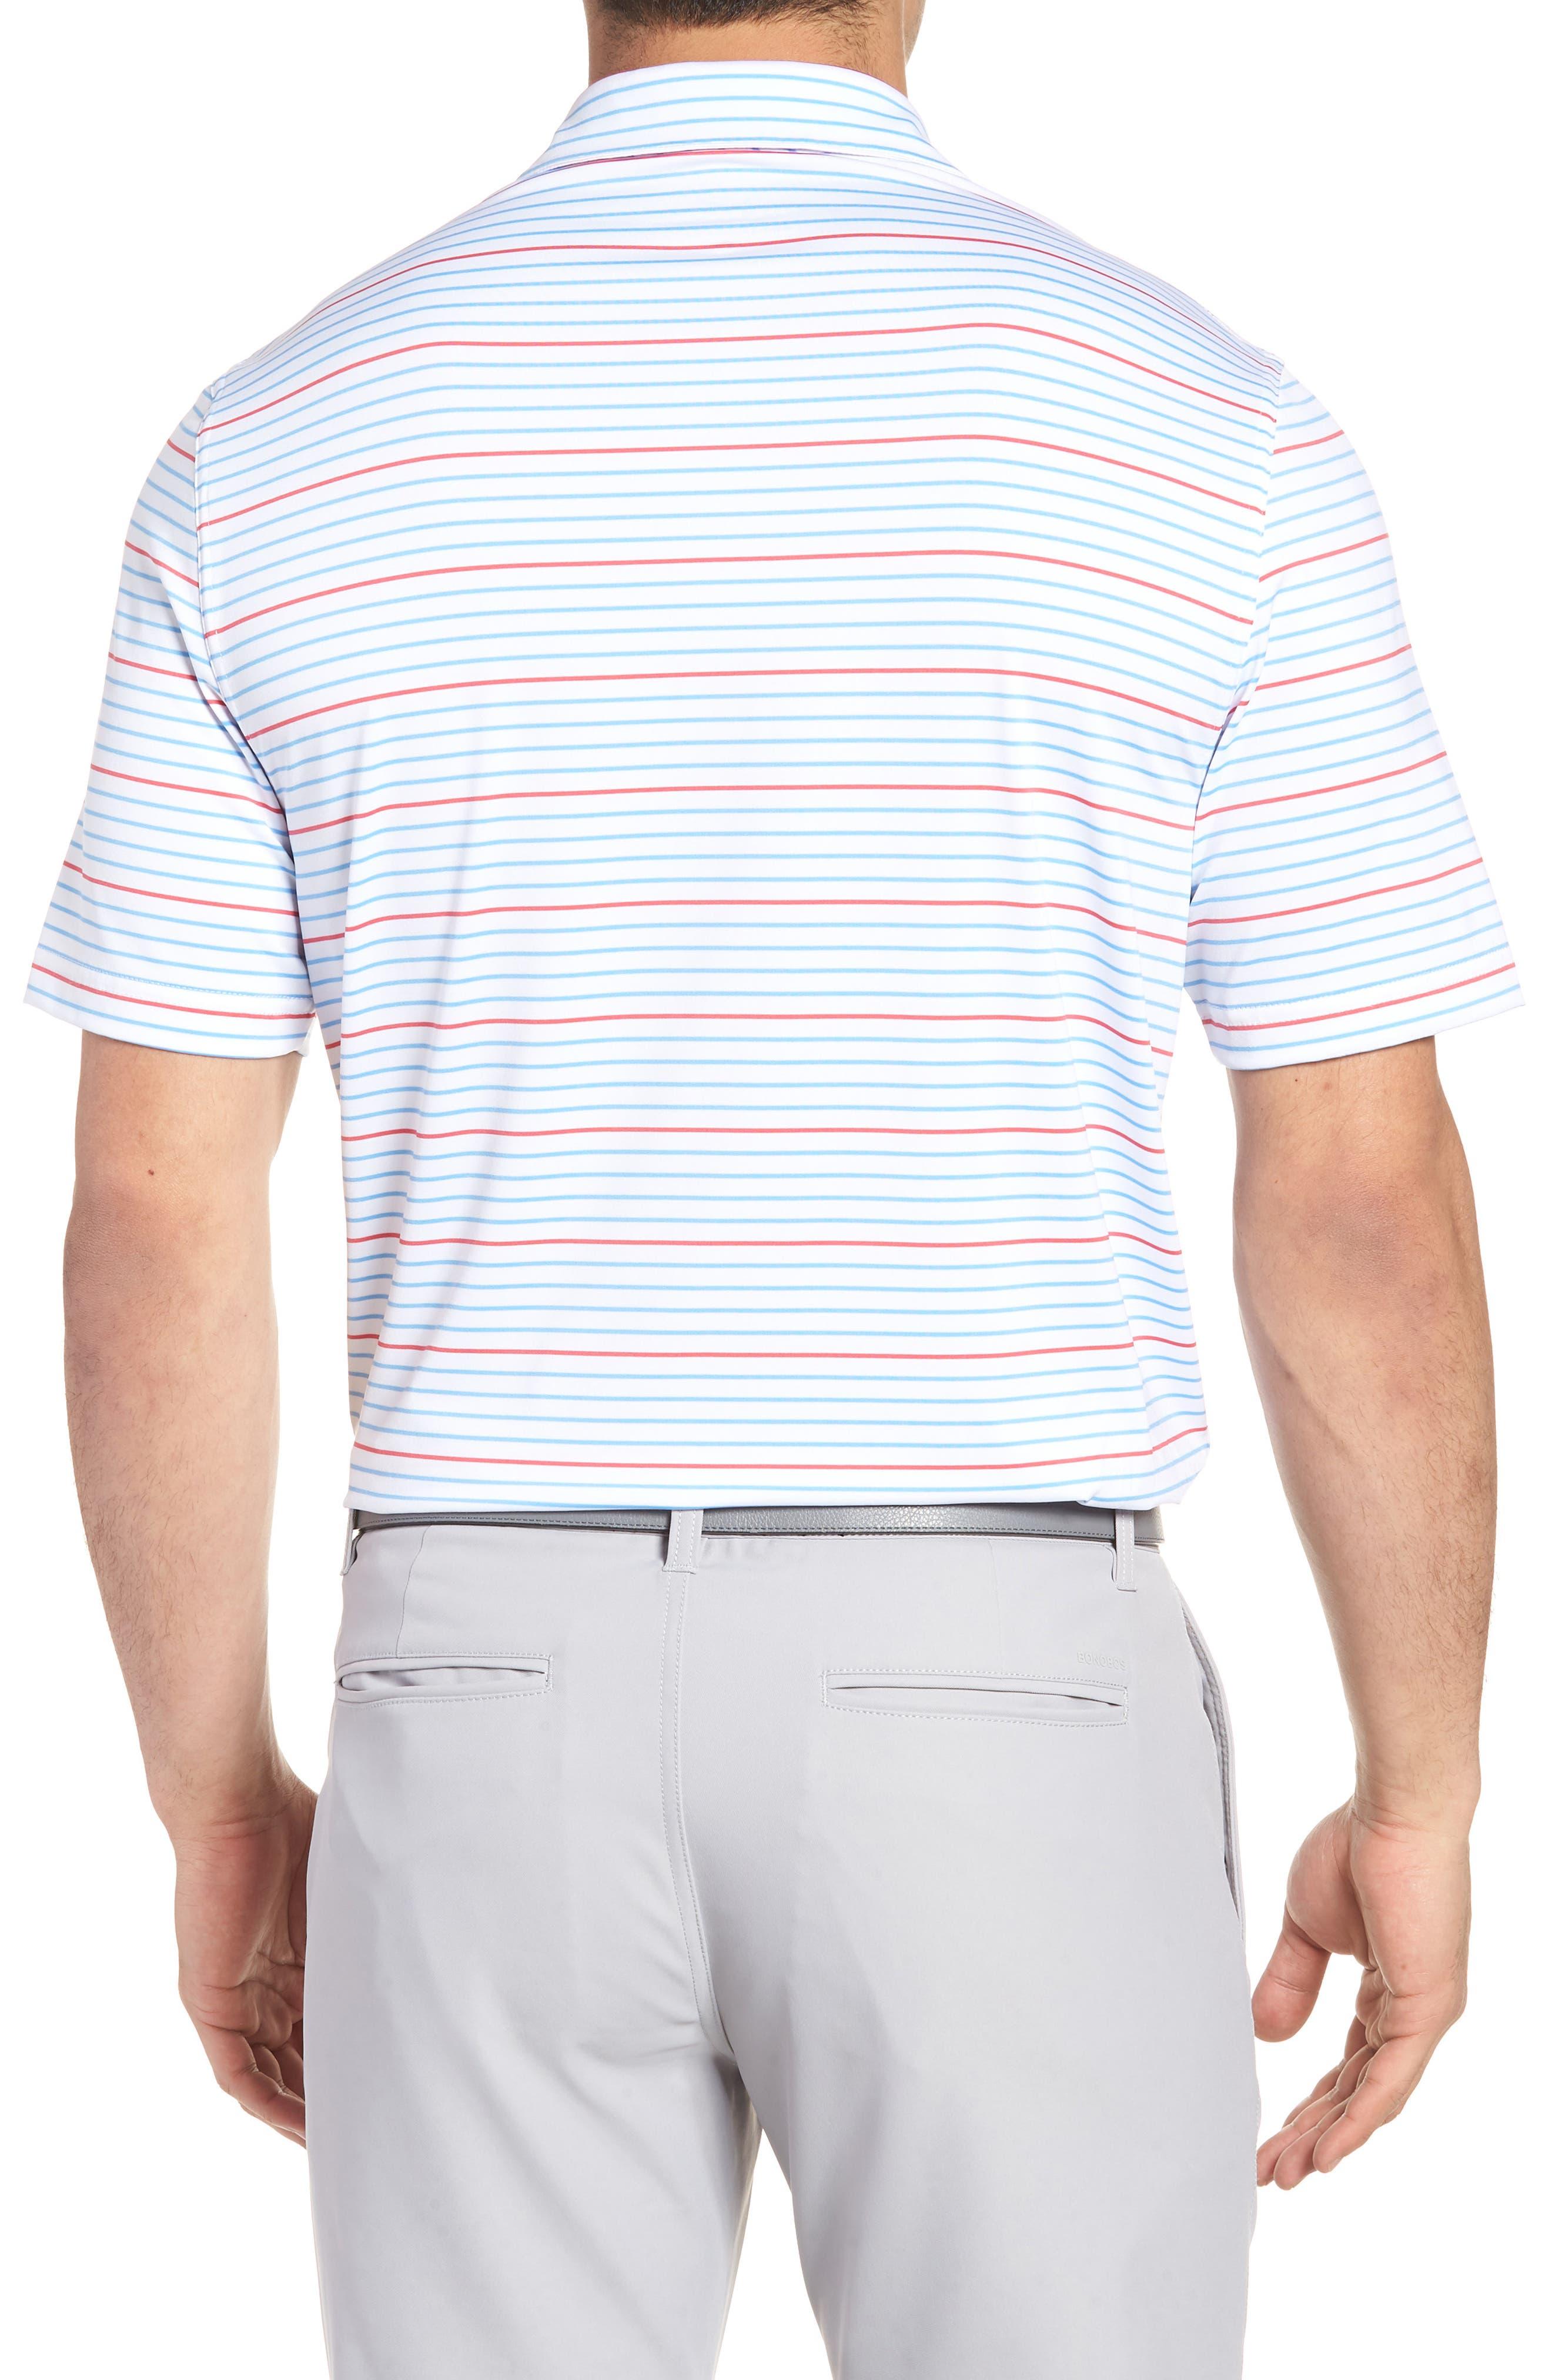 Swindell Stretch Stripe Polo,                             Alternate thumbnail 2, color,                             White Cap